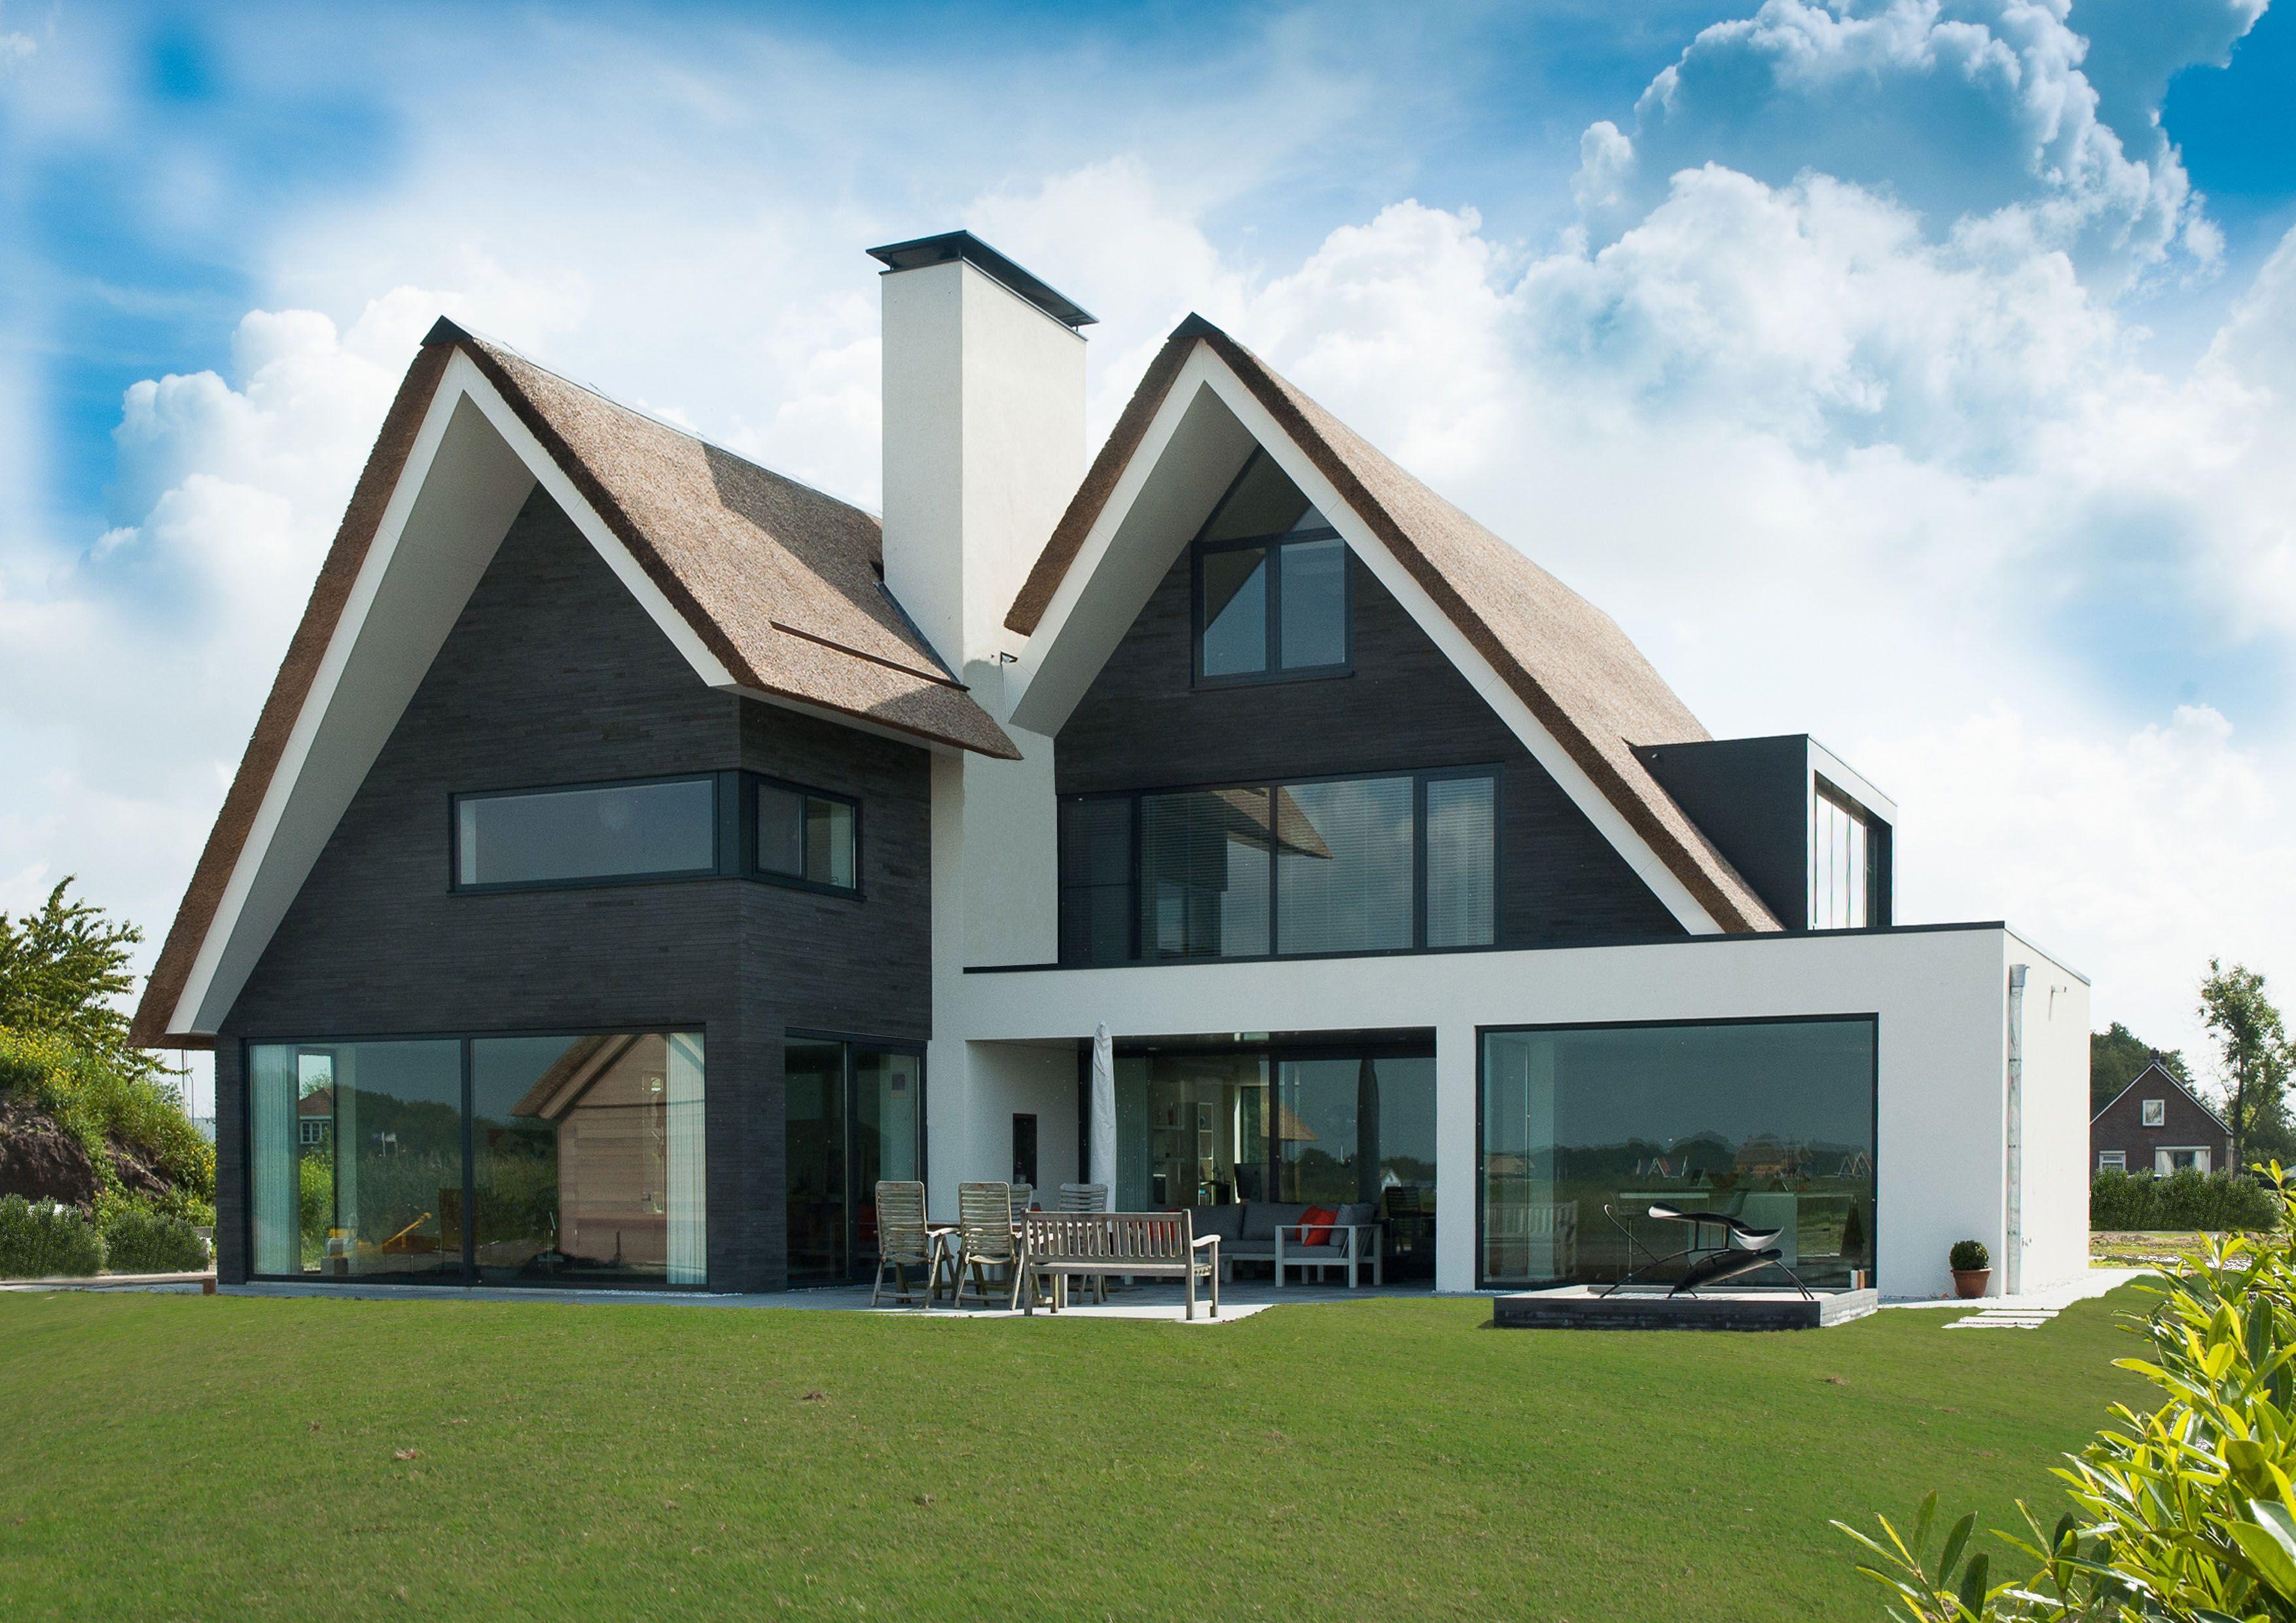 Piet boon google zoeken modern architecture house for Architect zoeken